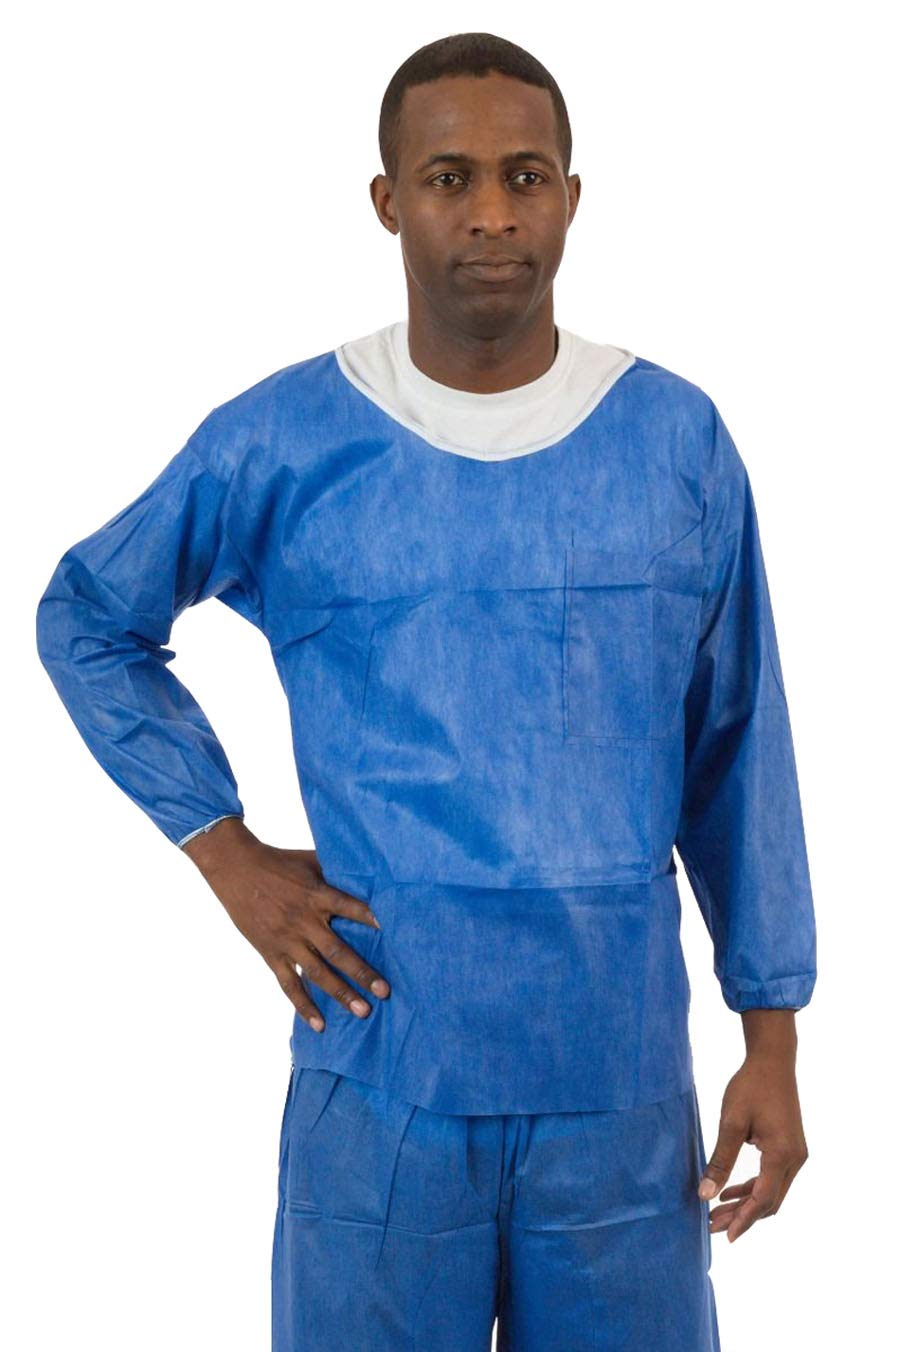 International Enviroguard Soft Scrubs | Protective Disposable Scrub Shirts & Pants for Men and Women | Blue, Pack of 50 (M, Long Sleeve Shirt)